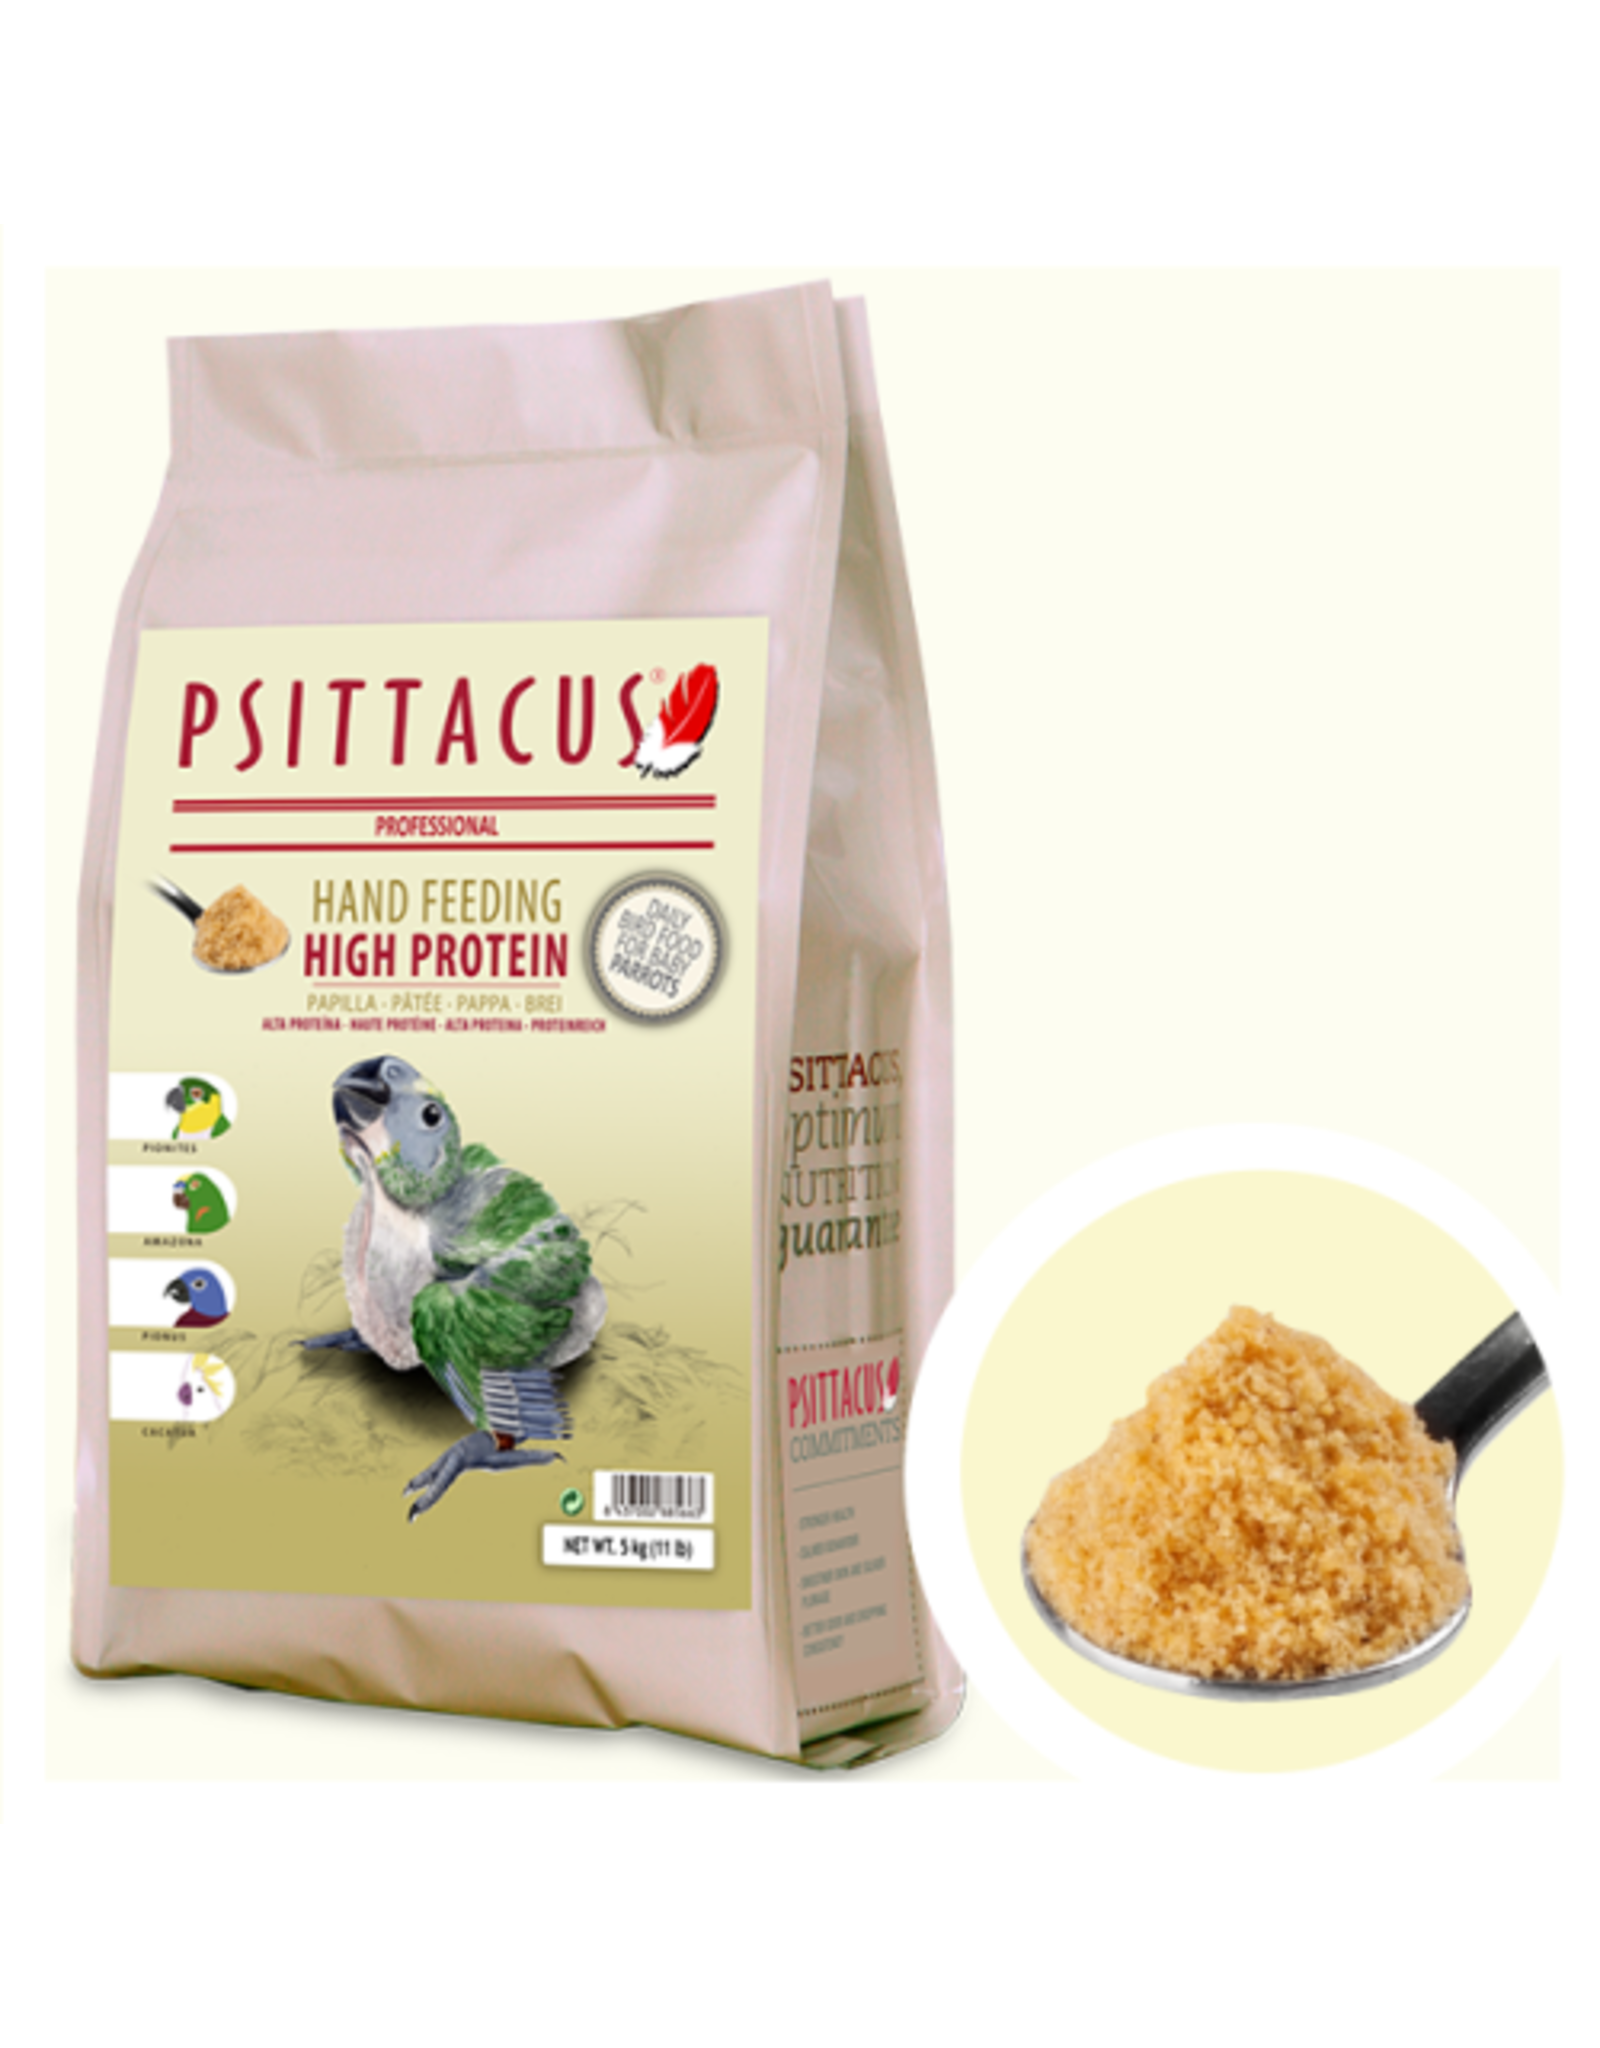 Psittacus HP hand-feeding formula 2.2lbs